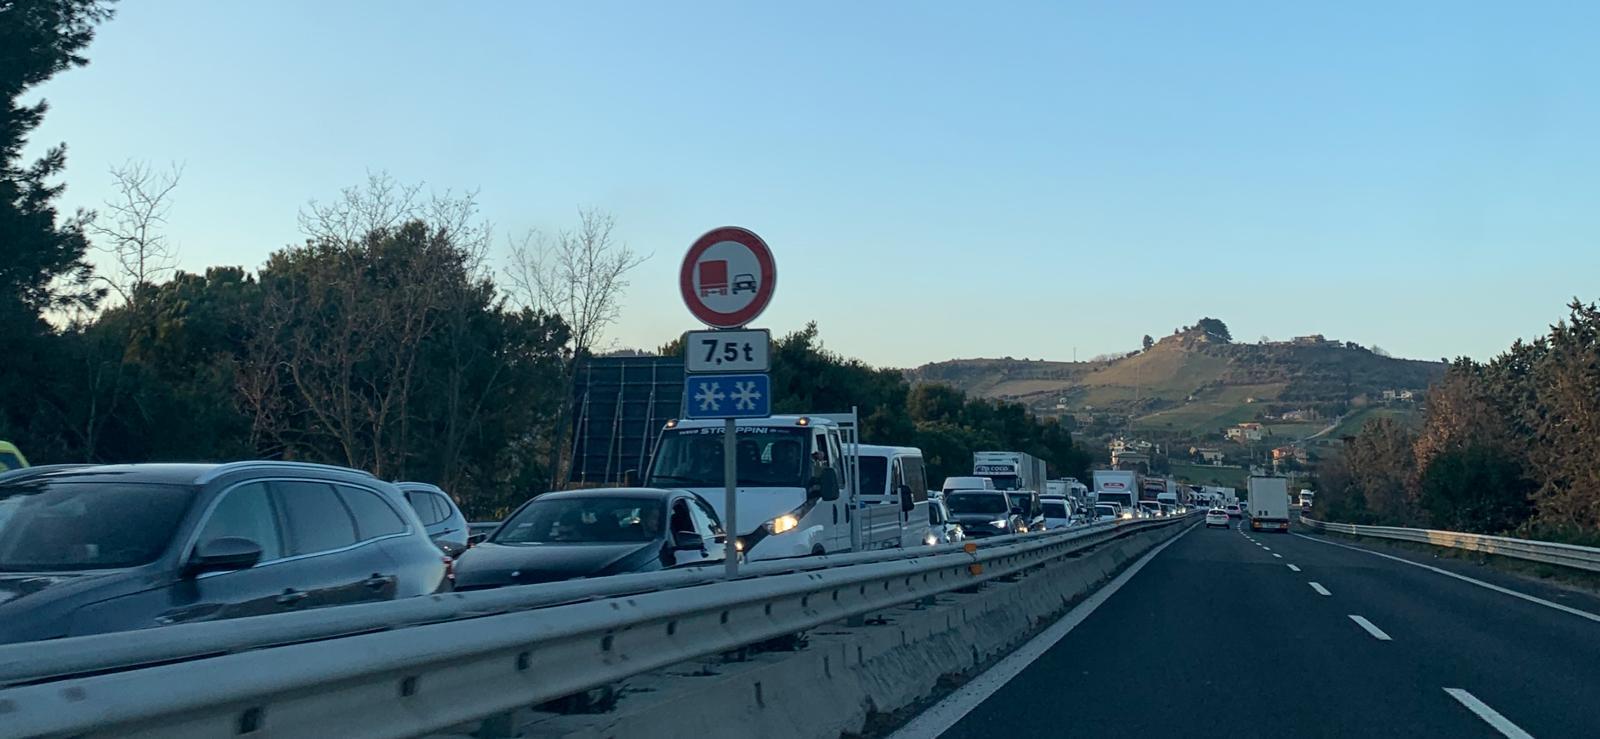 autostrada-coda-21-febbraio-2020